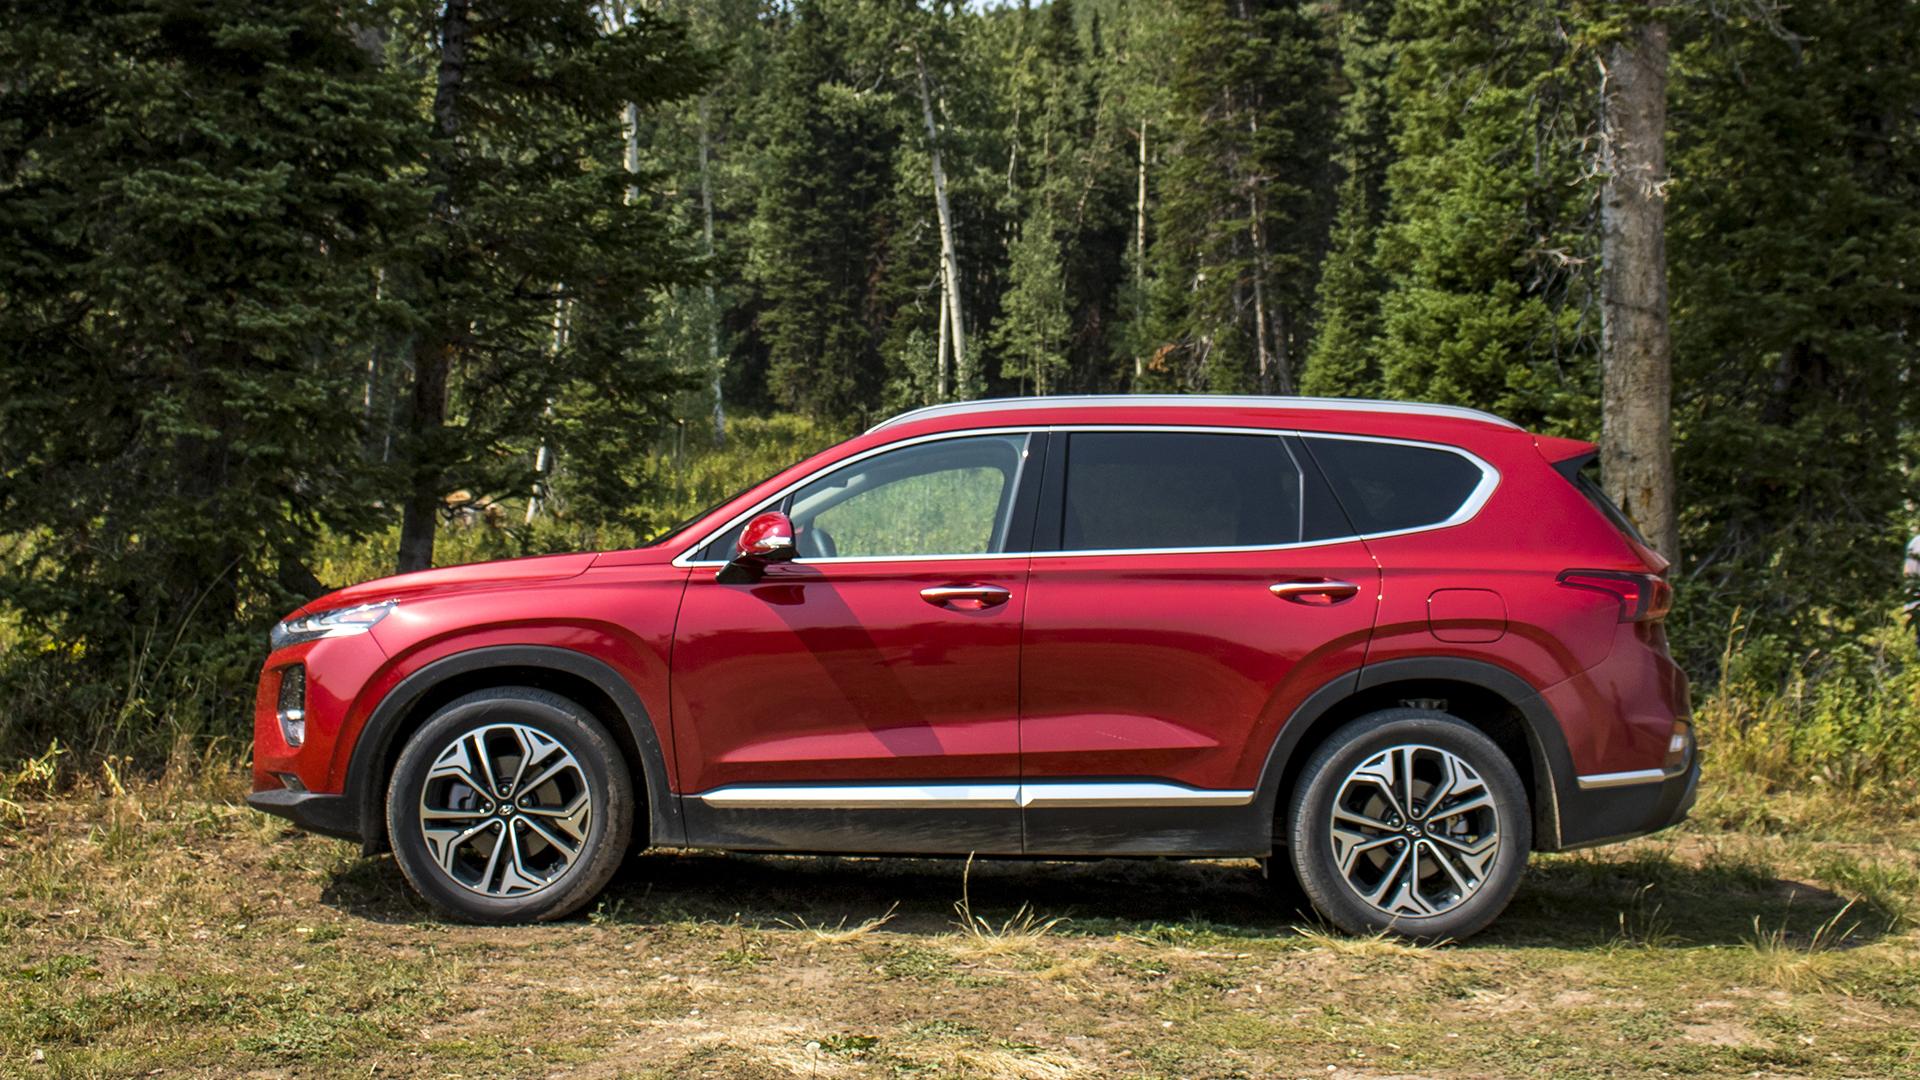 2019 Hyundai Santa Fe First Drive Review: A Mature Midsize SUV